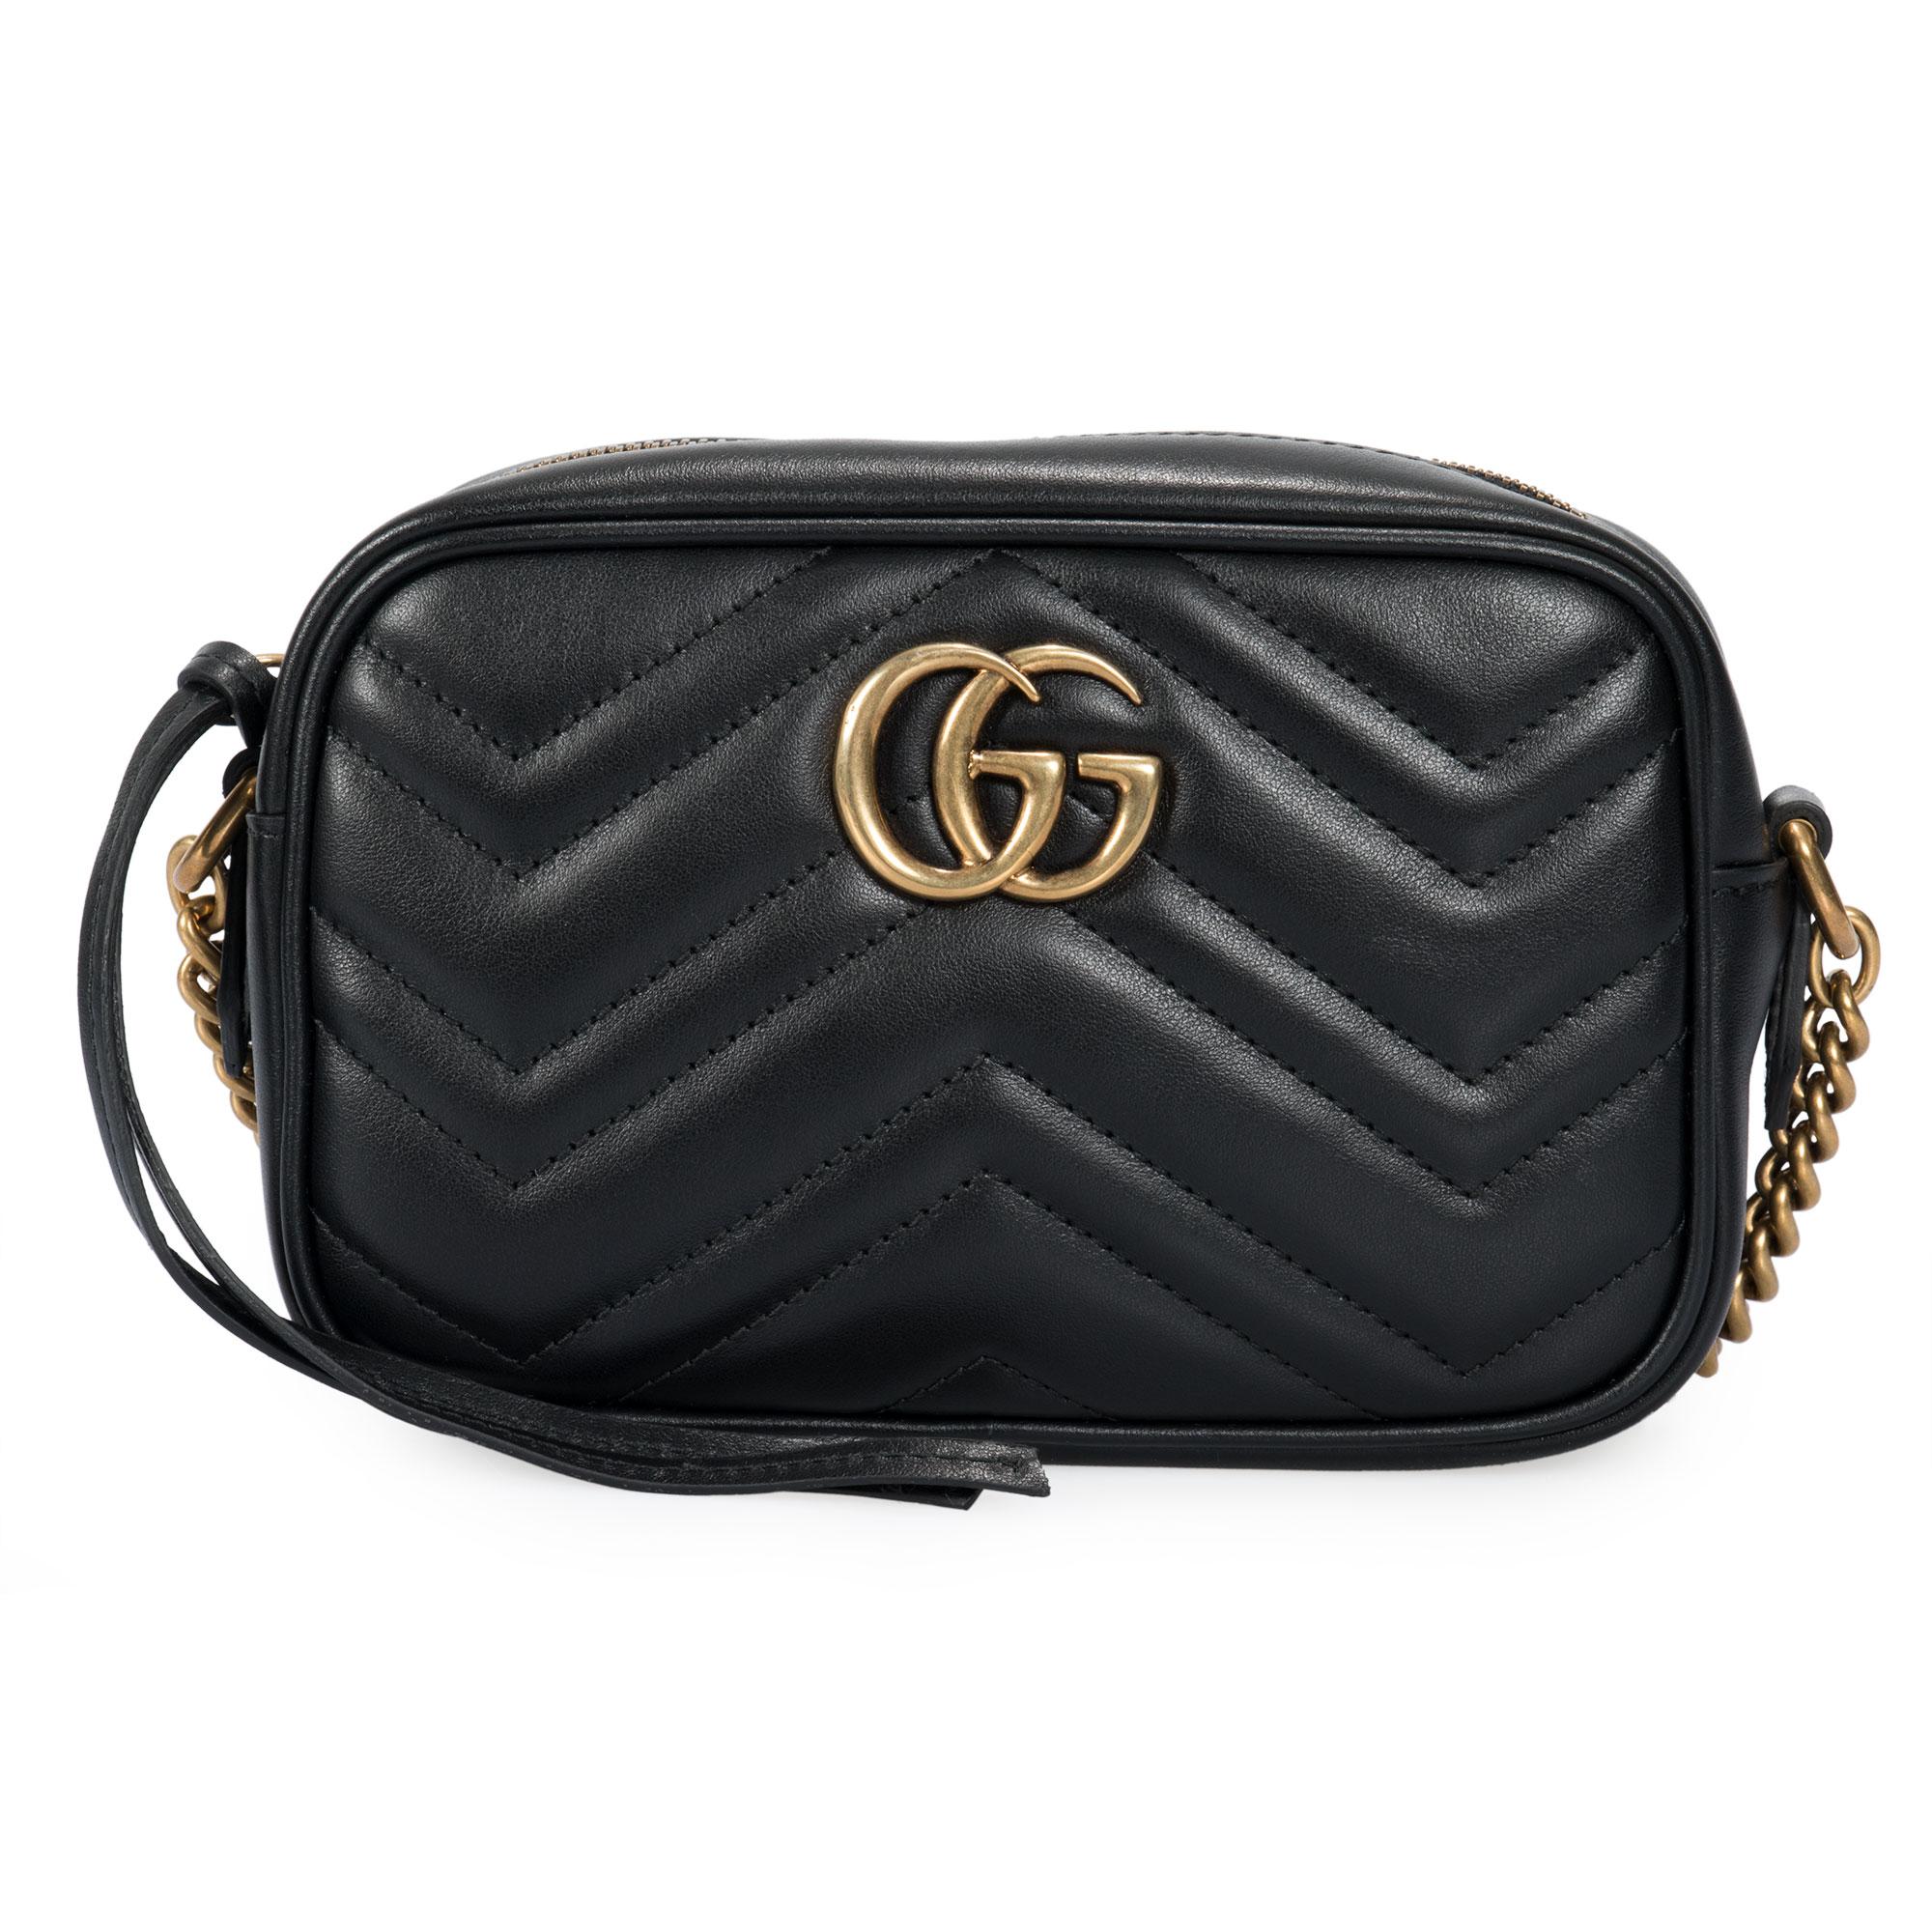 dfebc01e2639 Gucci GG Marmont Matelasse Mini Shoulder Bag 727371138209